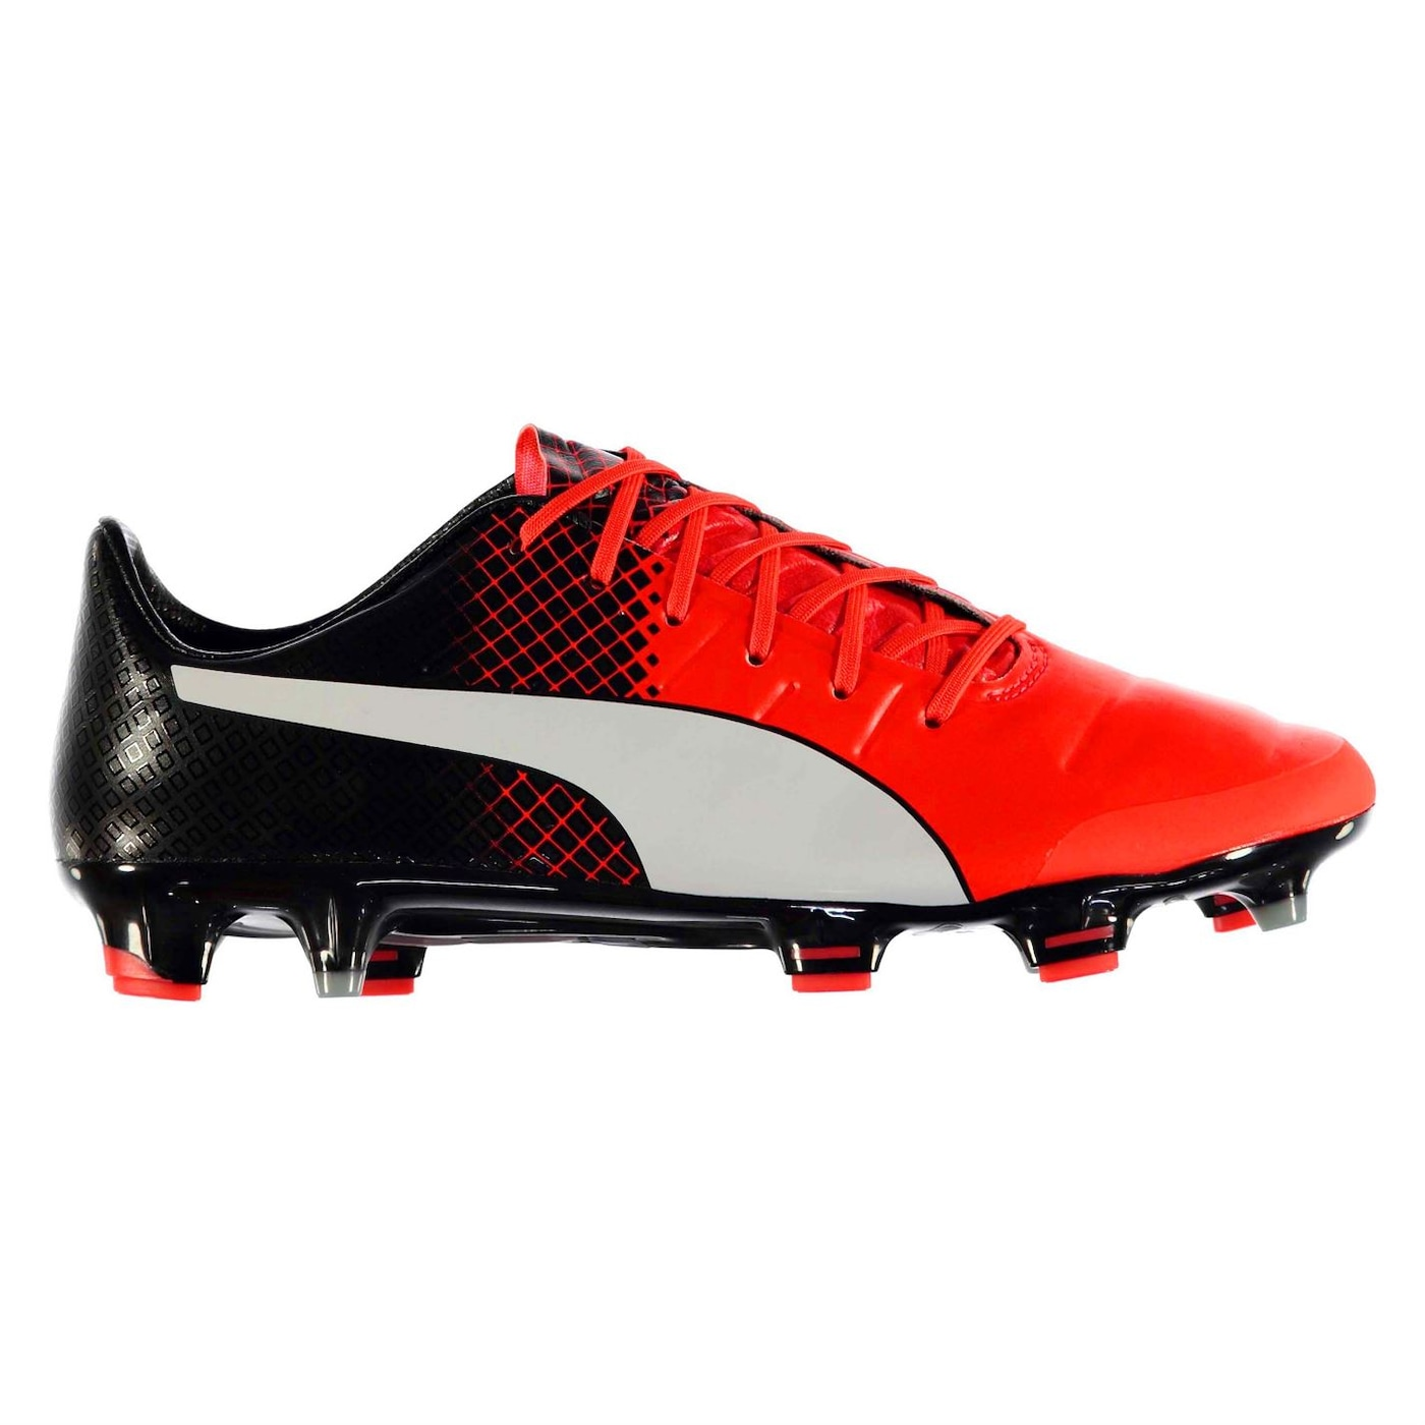 Puma EvoPower 1.3 FG Football Boots Mens